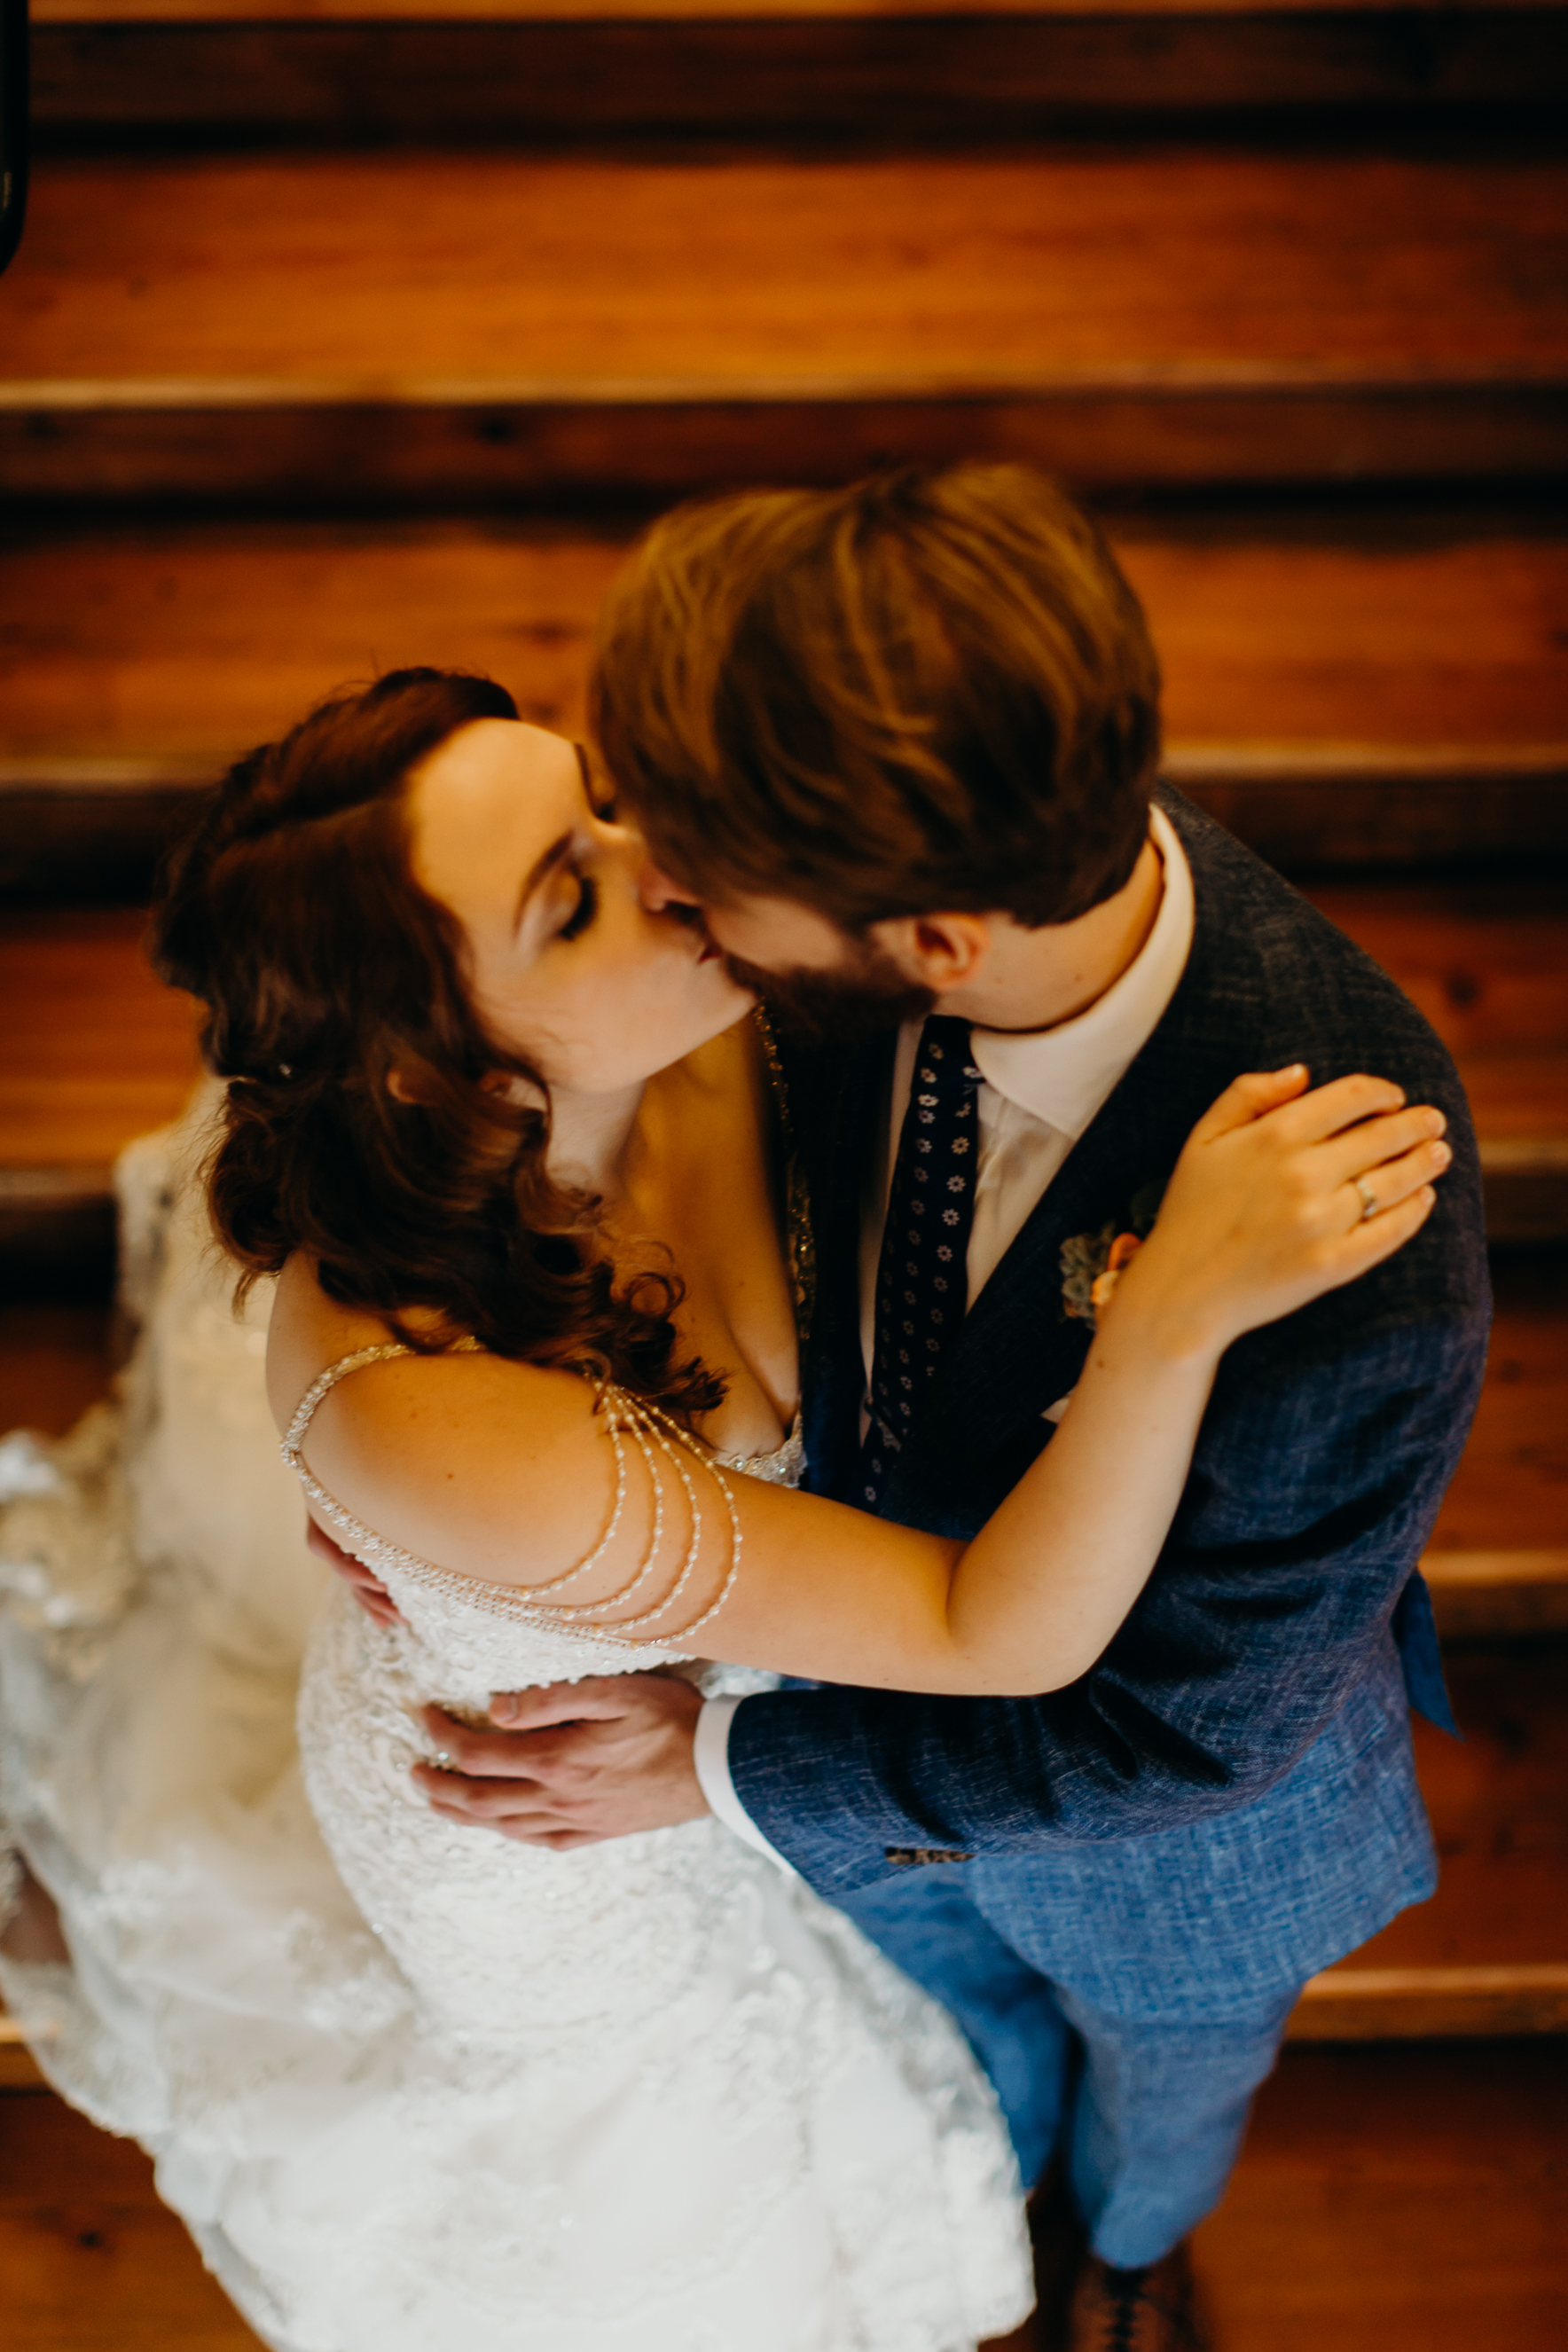 Gianna Keiko Atlanta Chattanooga Destination Wedding Portrait Photographer-36.jpg